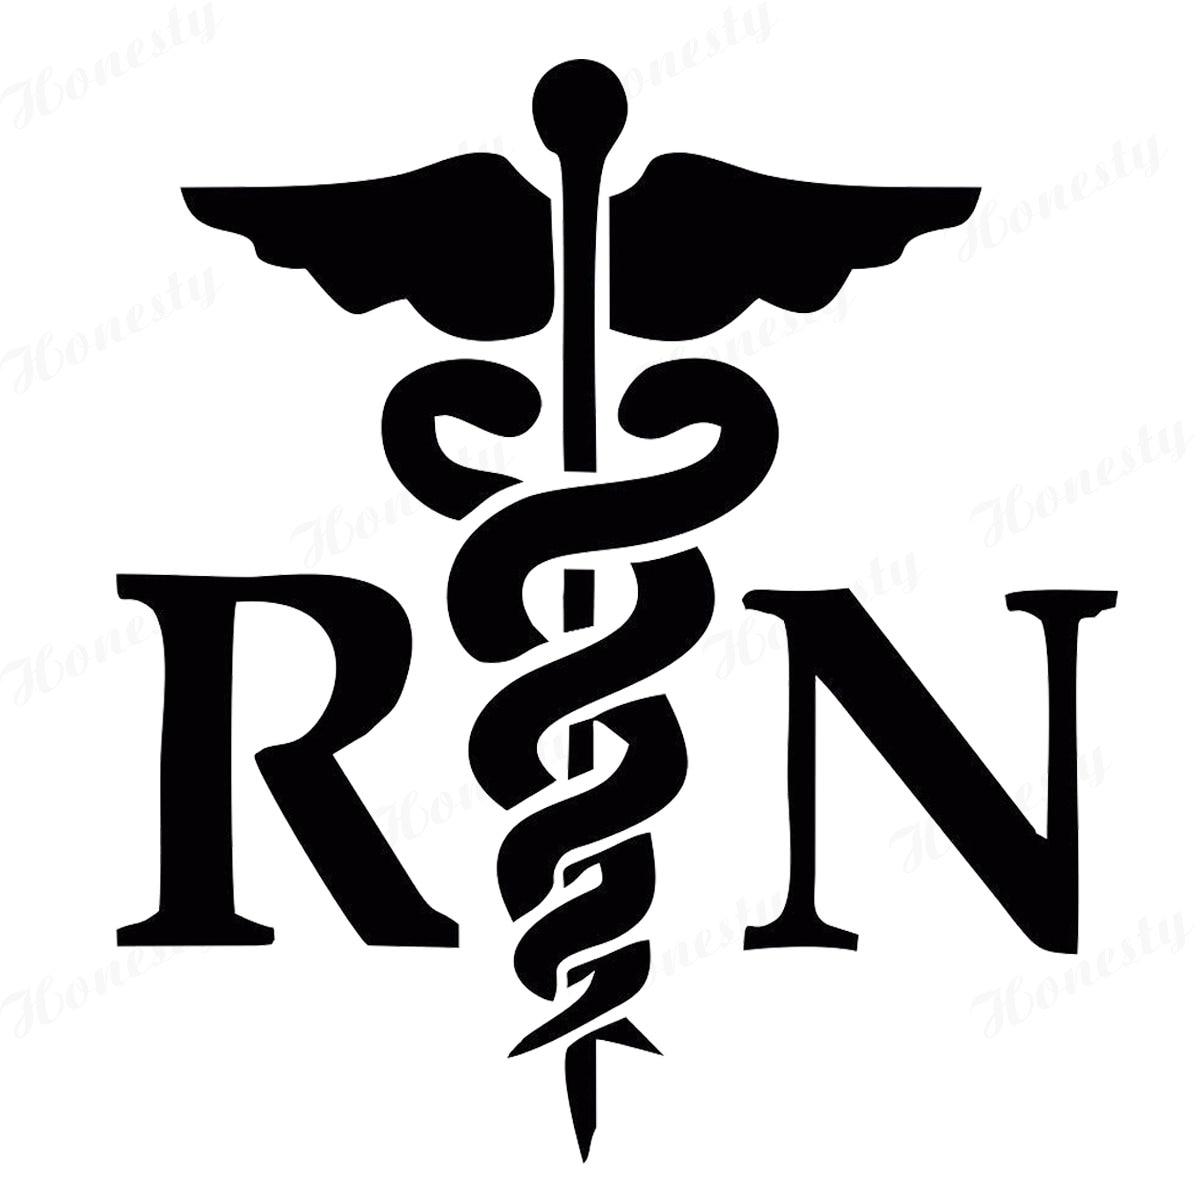 caduceus rn vinyl sticker decal registered nurse